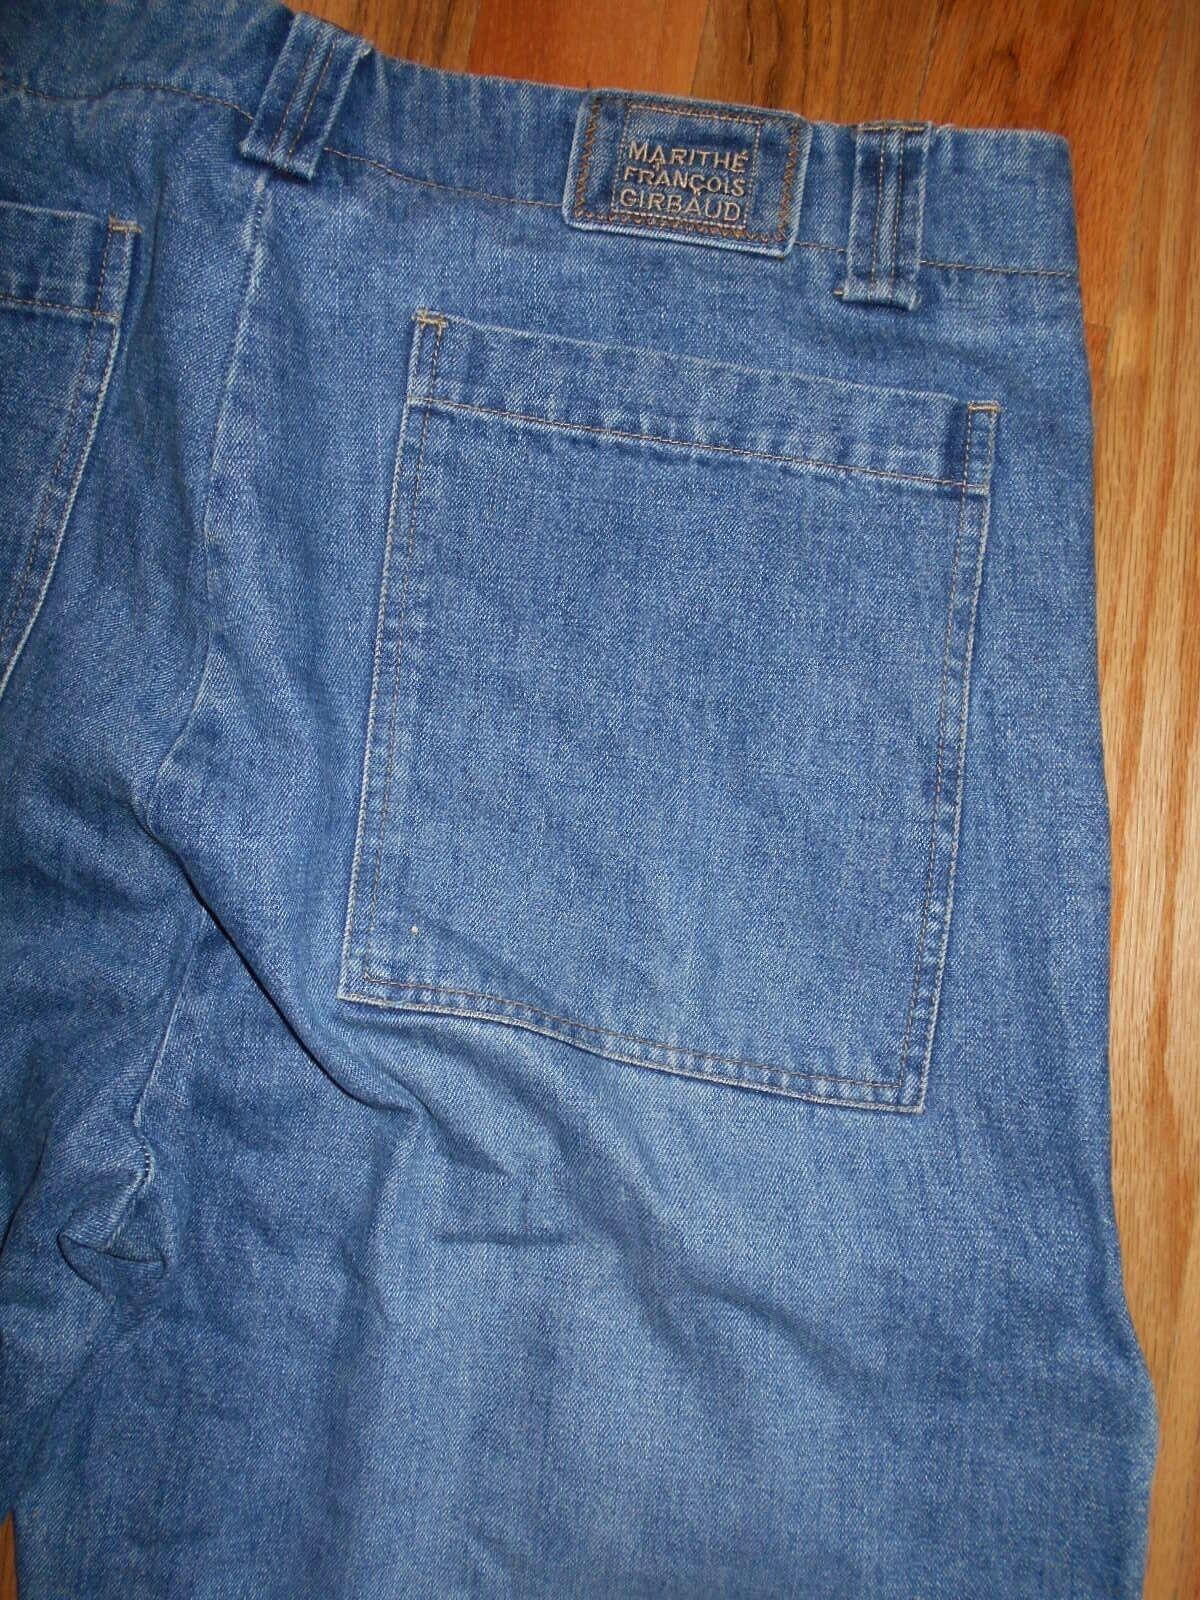 Jeans Mens 42x35 Marthe Francois Girbaud Cinch Leg bluee Denim Pants 6J134